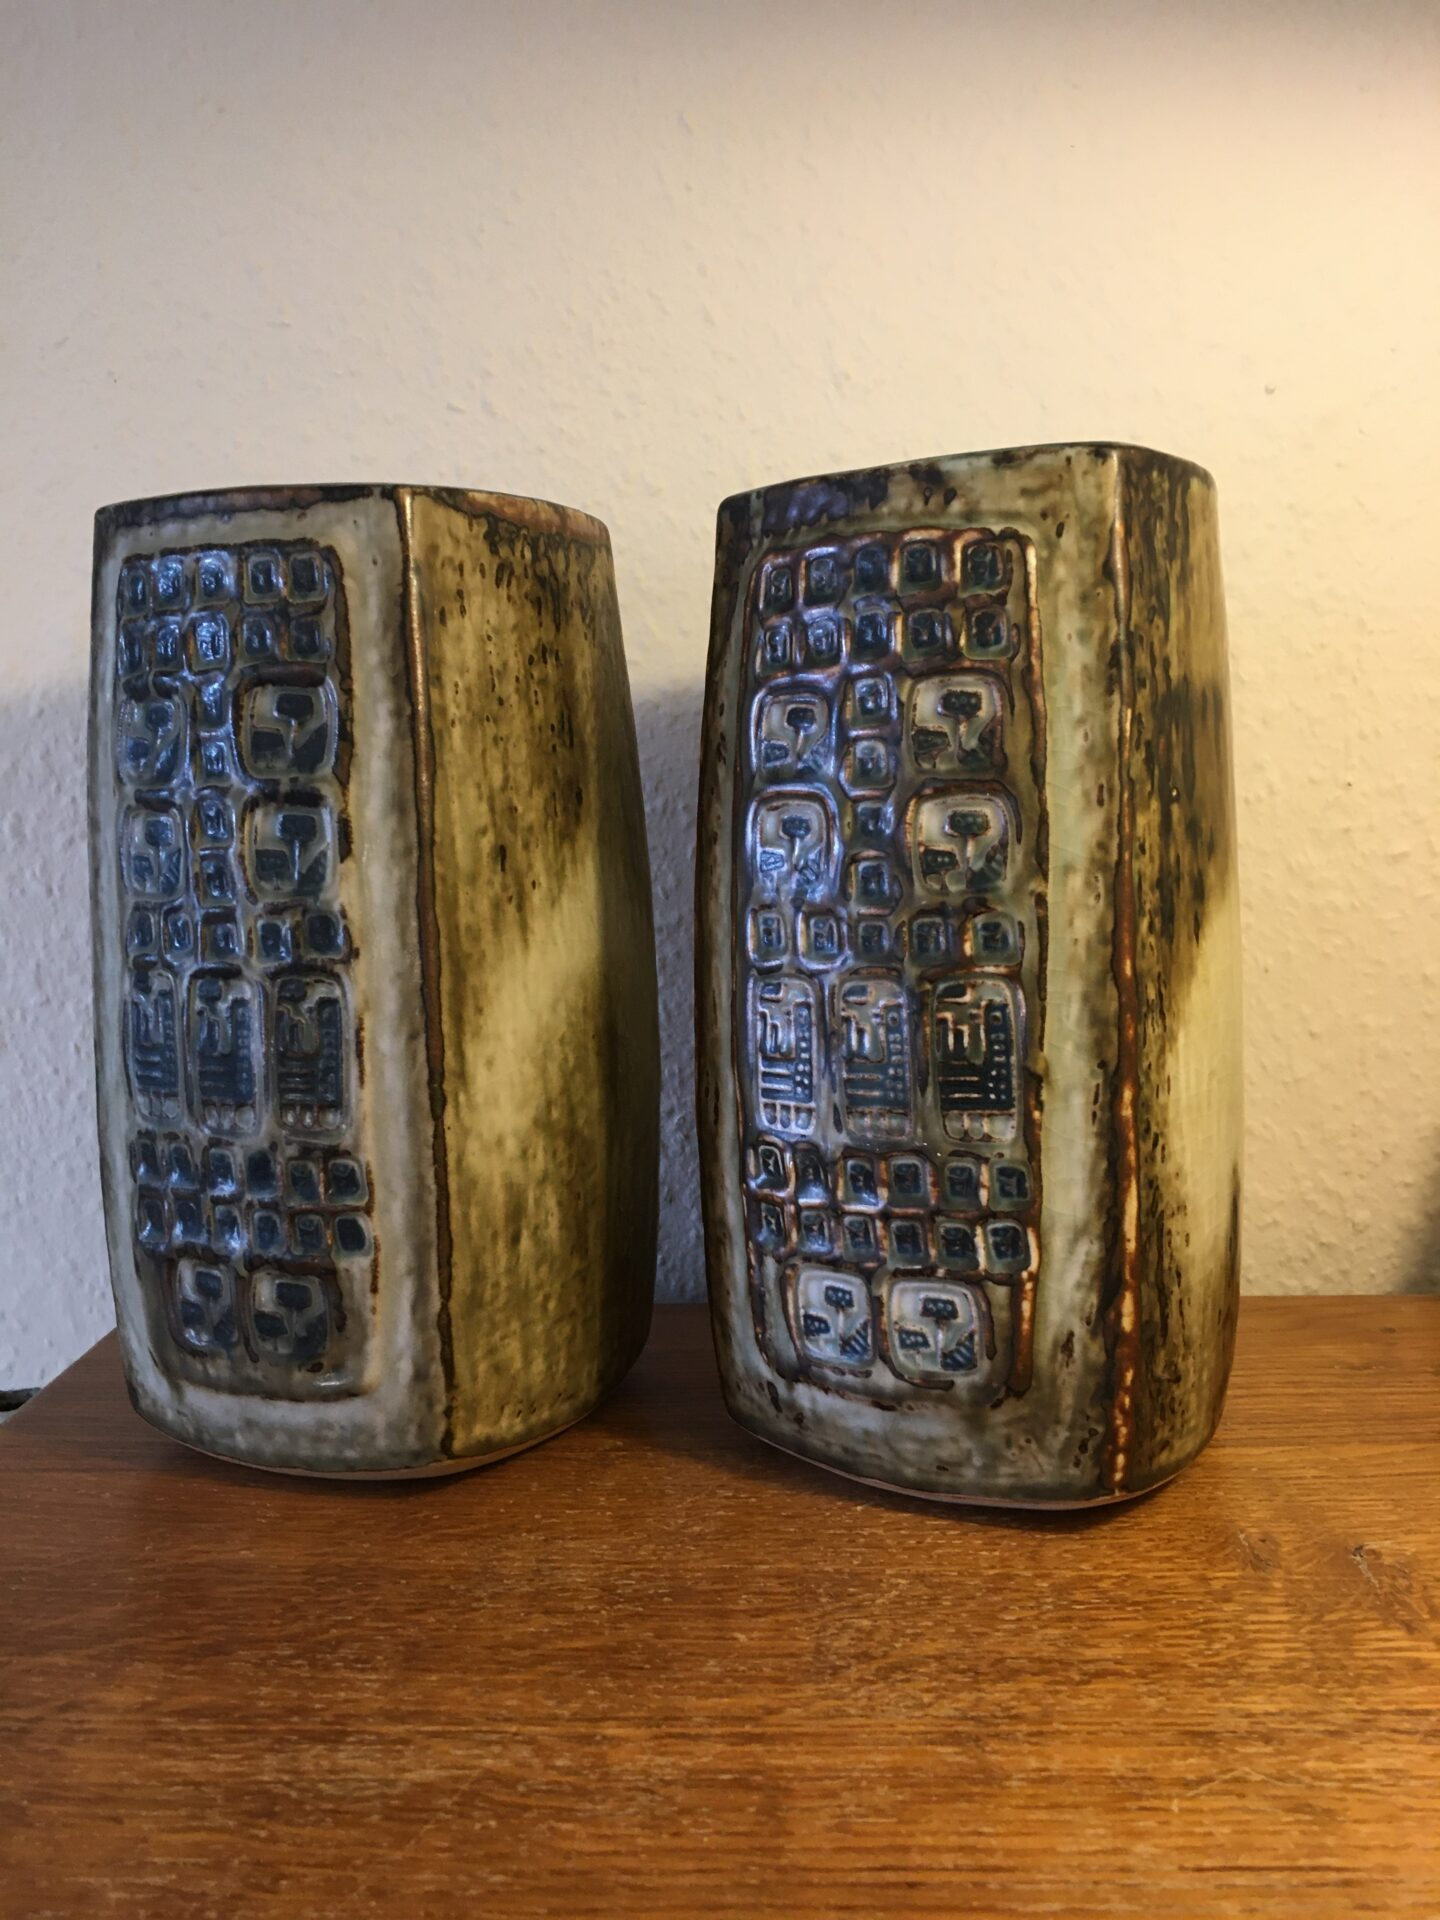 2 stk Royal Copenhagen stentøjsvaser, nr, 21923, 1. sortering, h=24,5 cm, samlet pris 1000kr